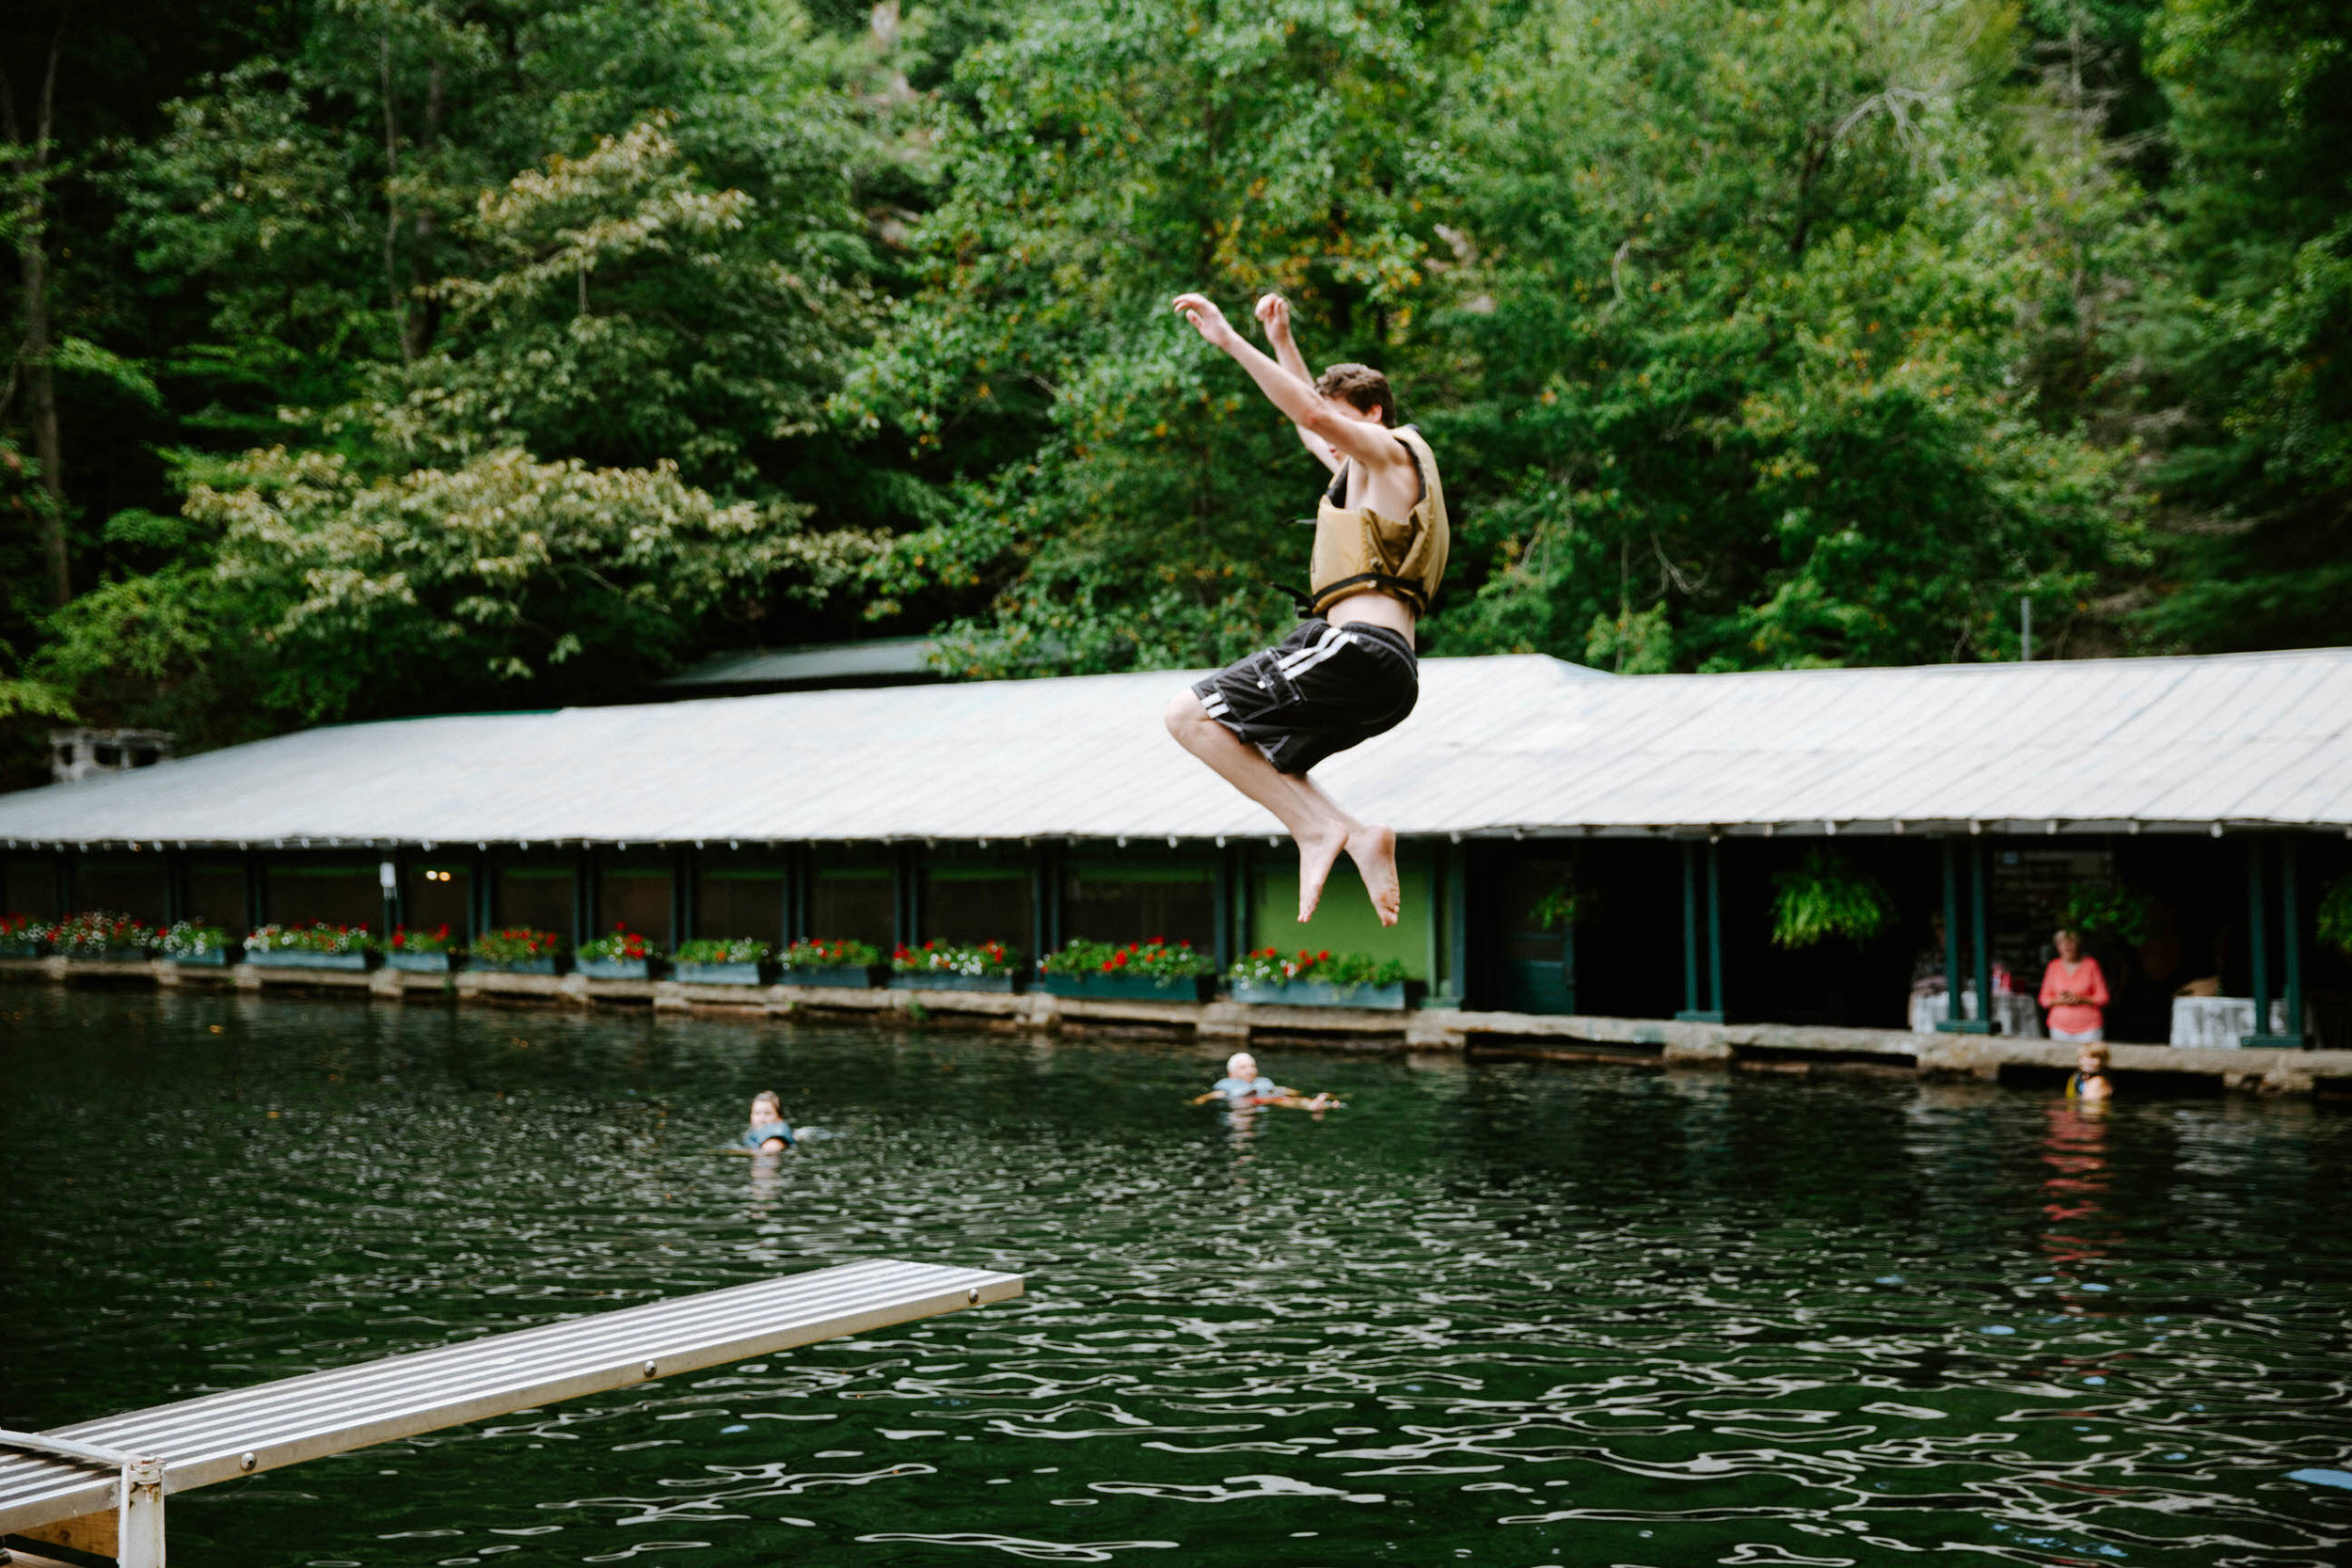 jeremy+elle-Lake-0685.jpg